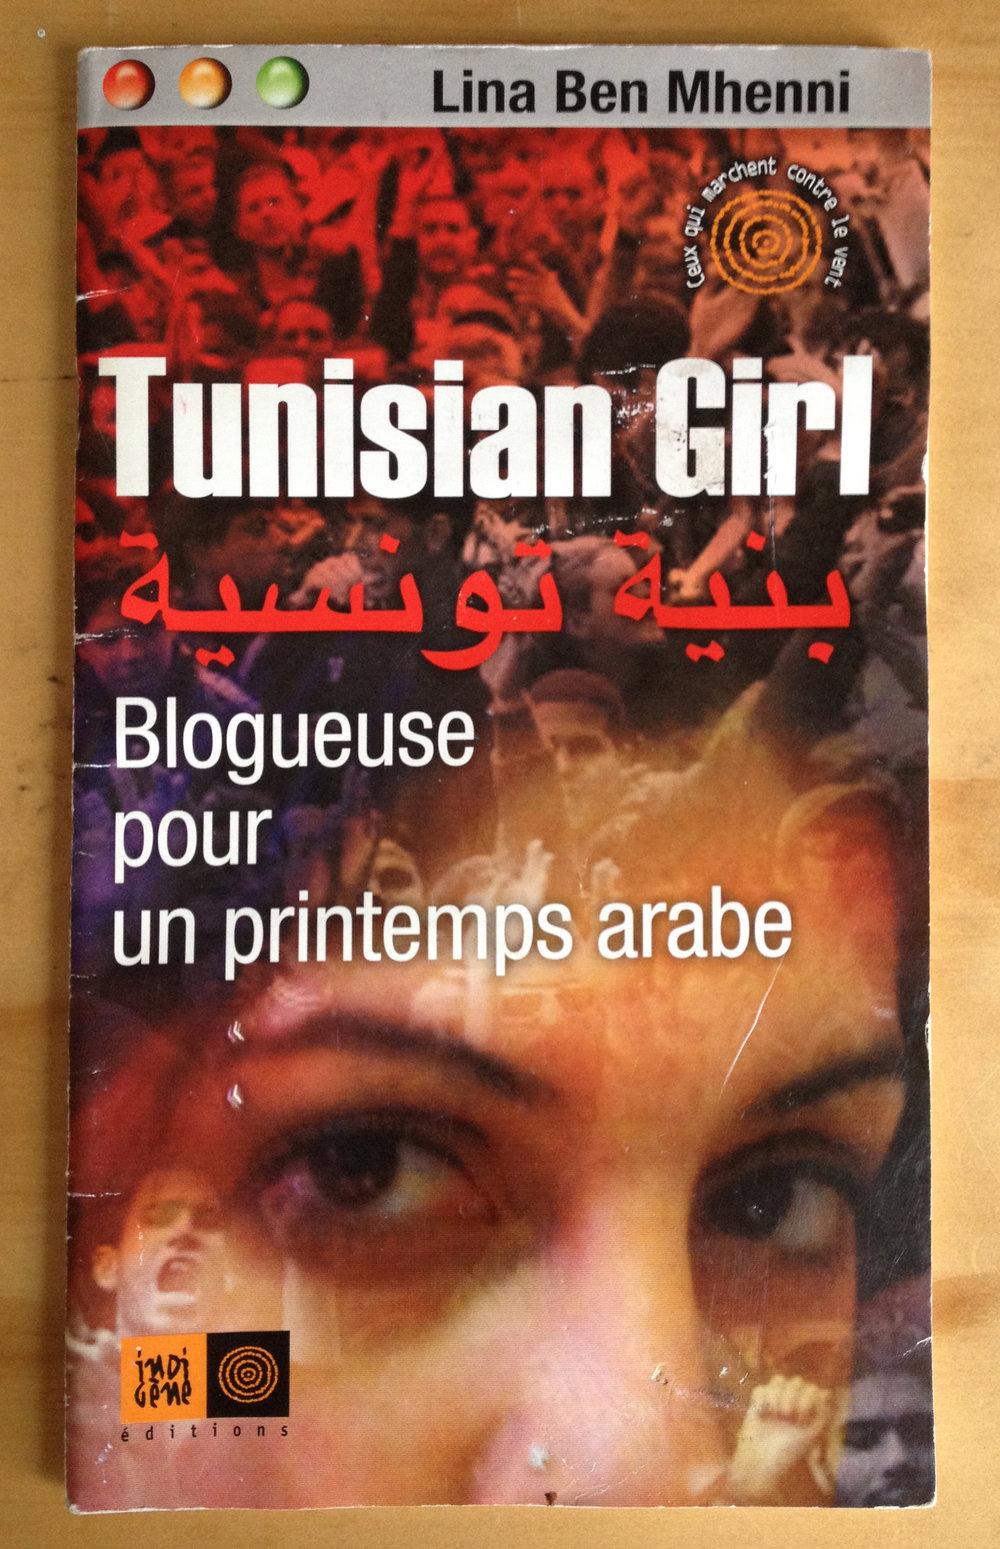 Tunisia, 2014